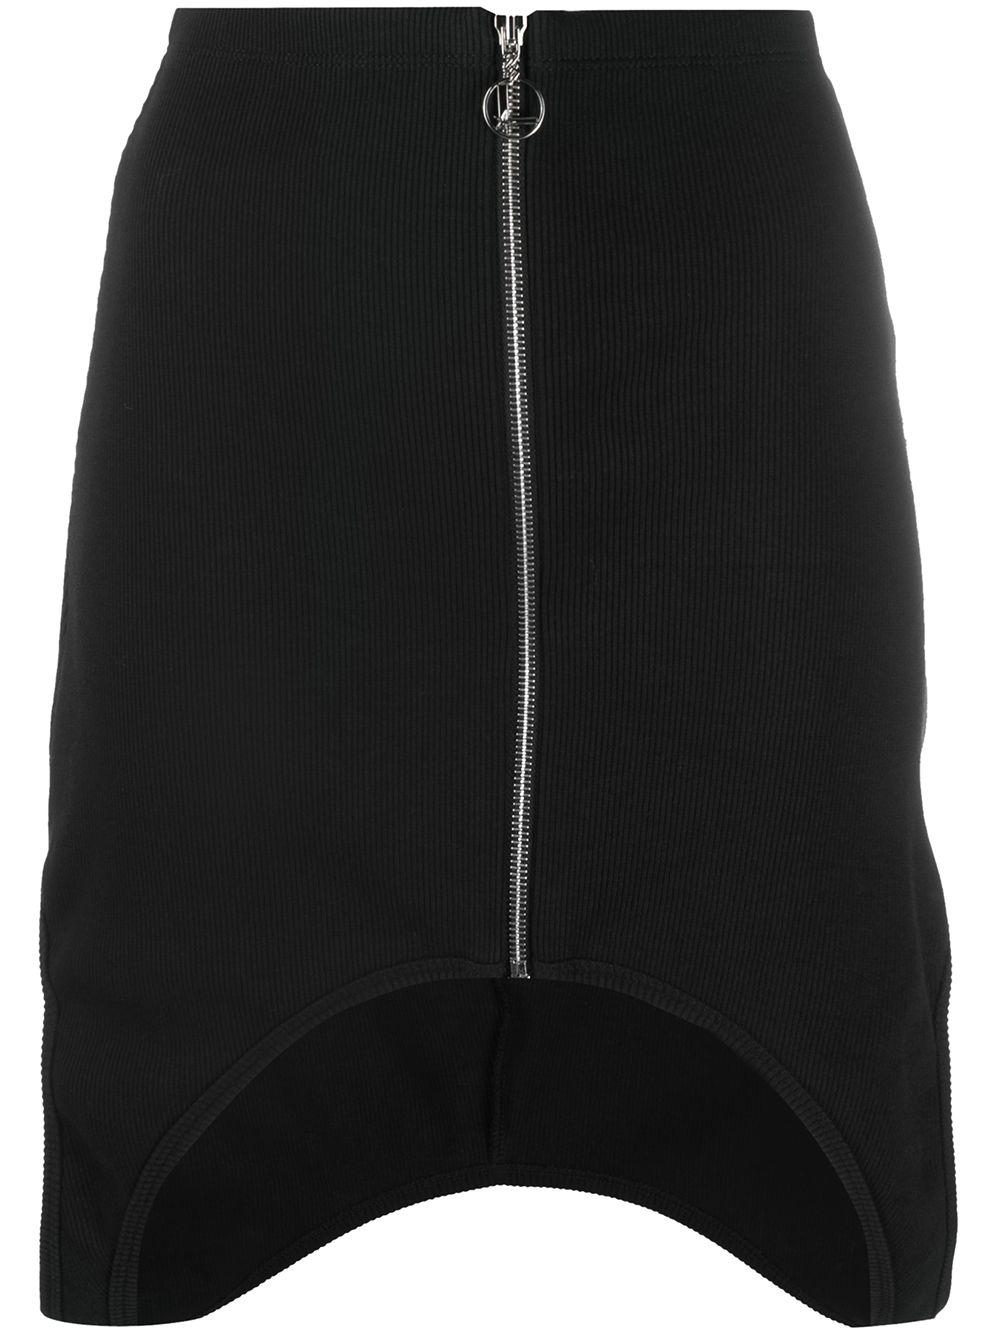 Cut-out Details Skirt